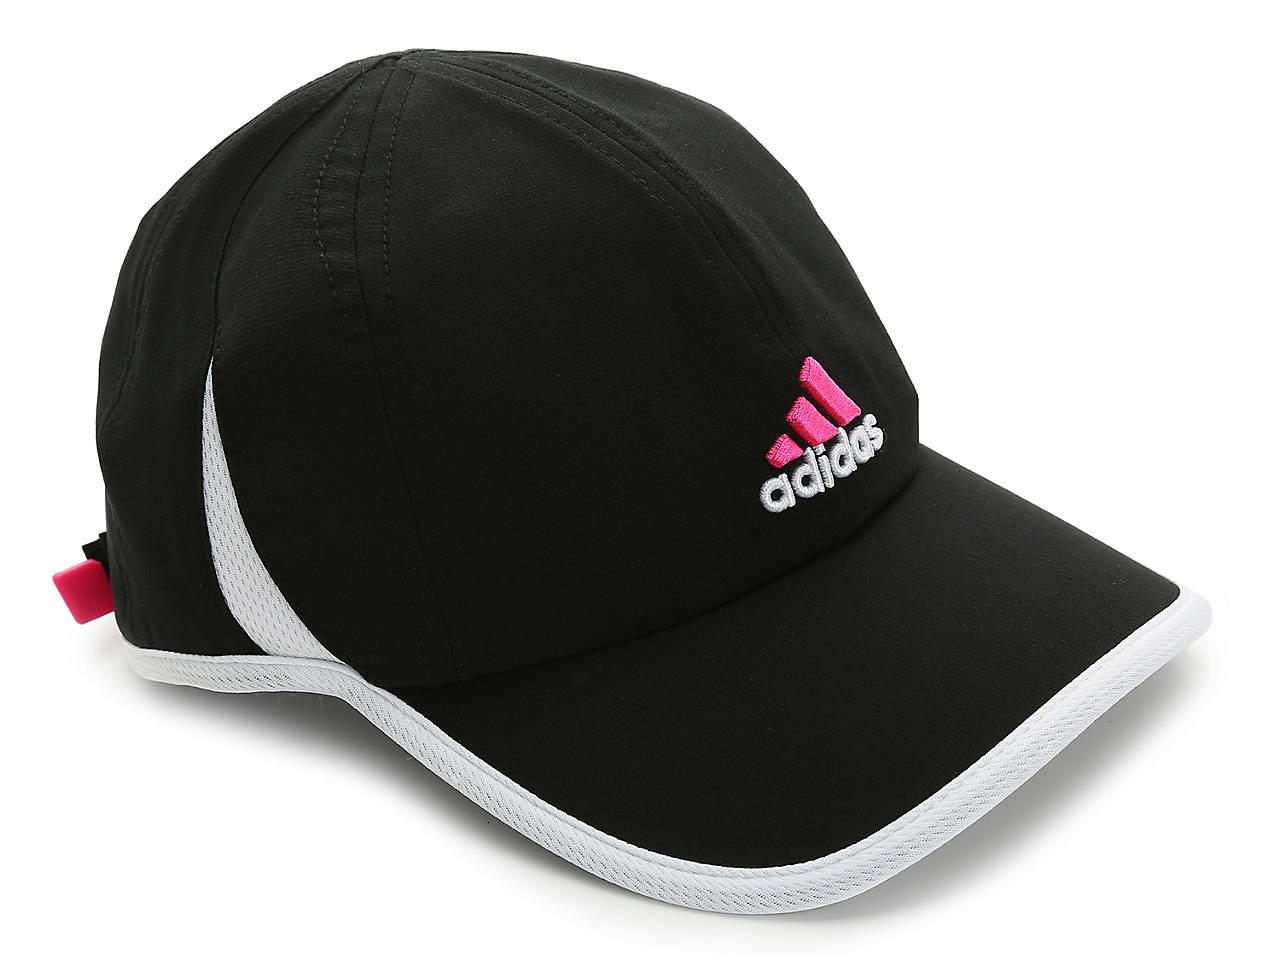 adidas Adizero II Baseball Cap Women s Handbags   Accessories  32781c0f9f9